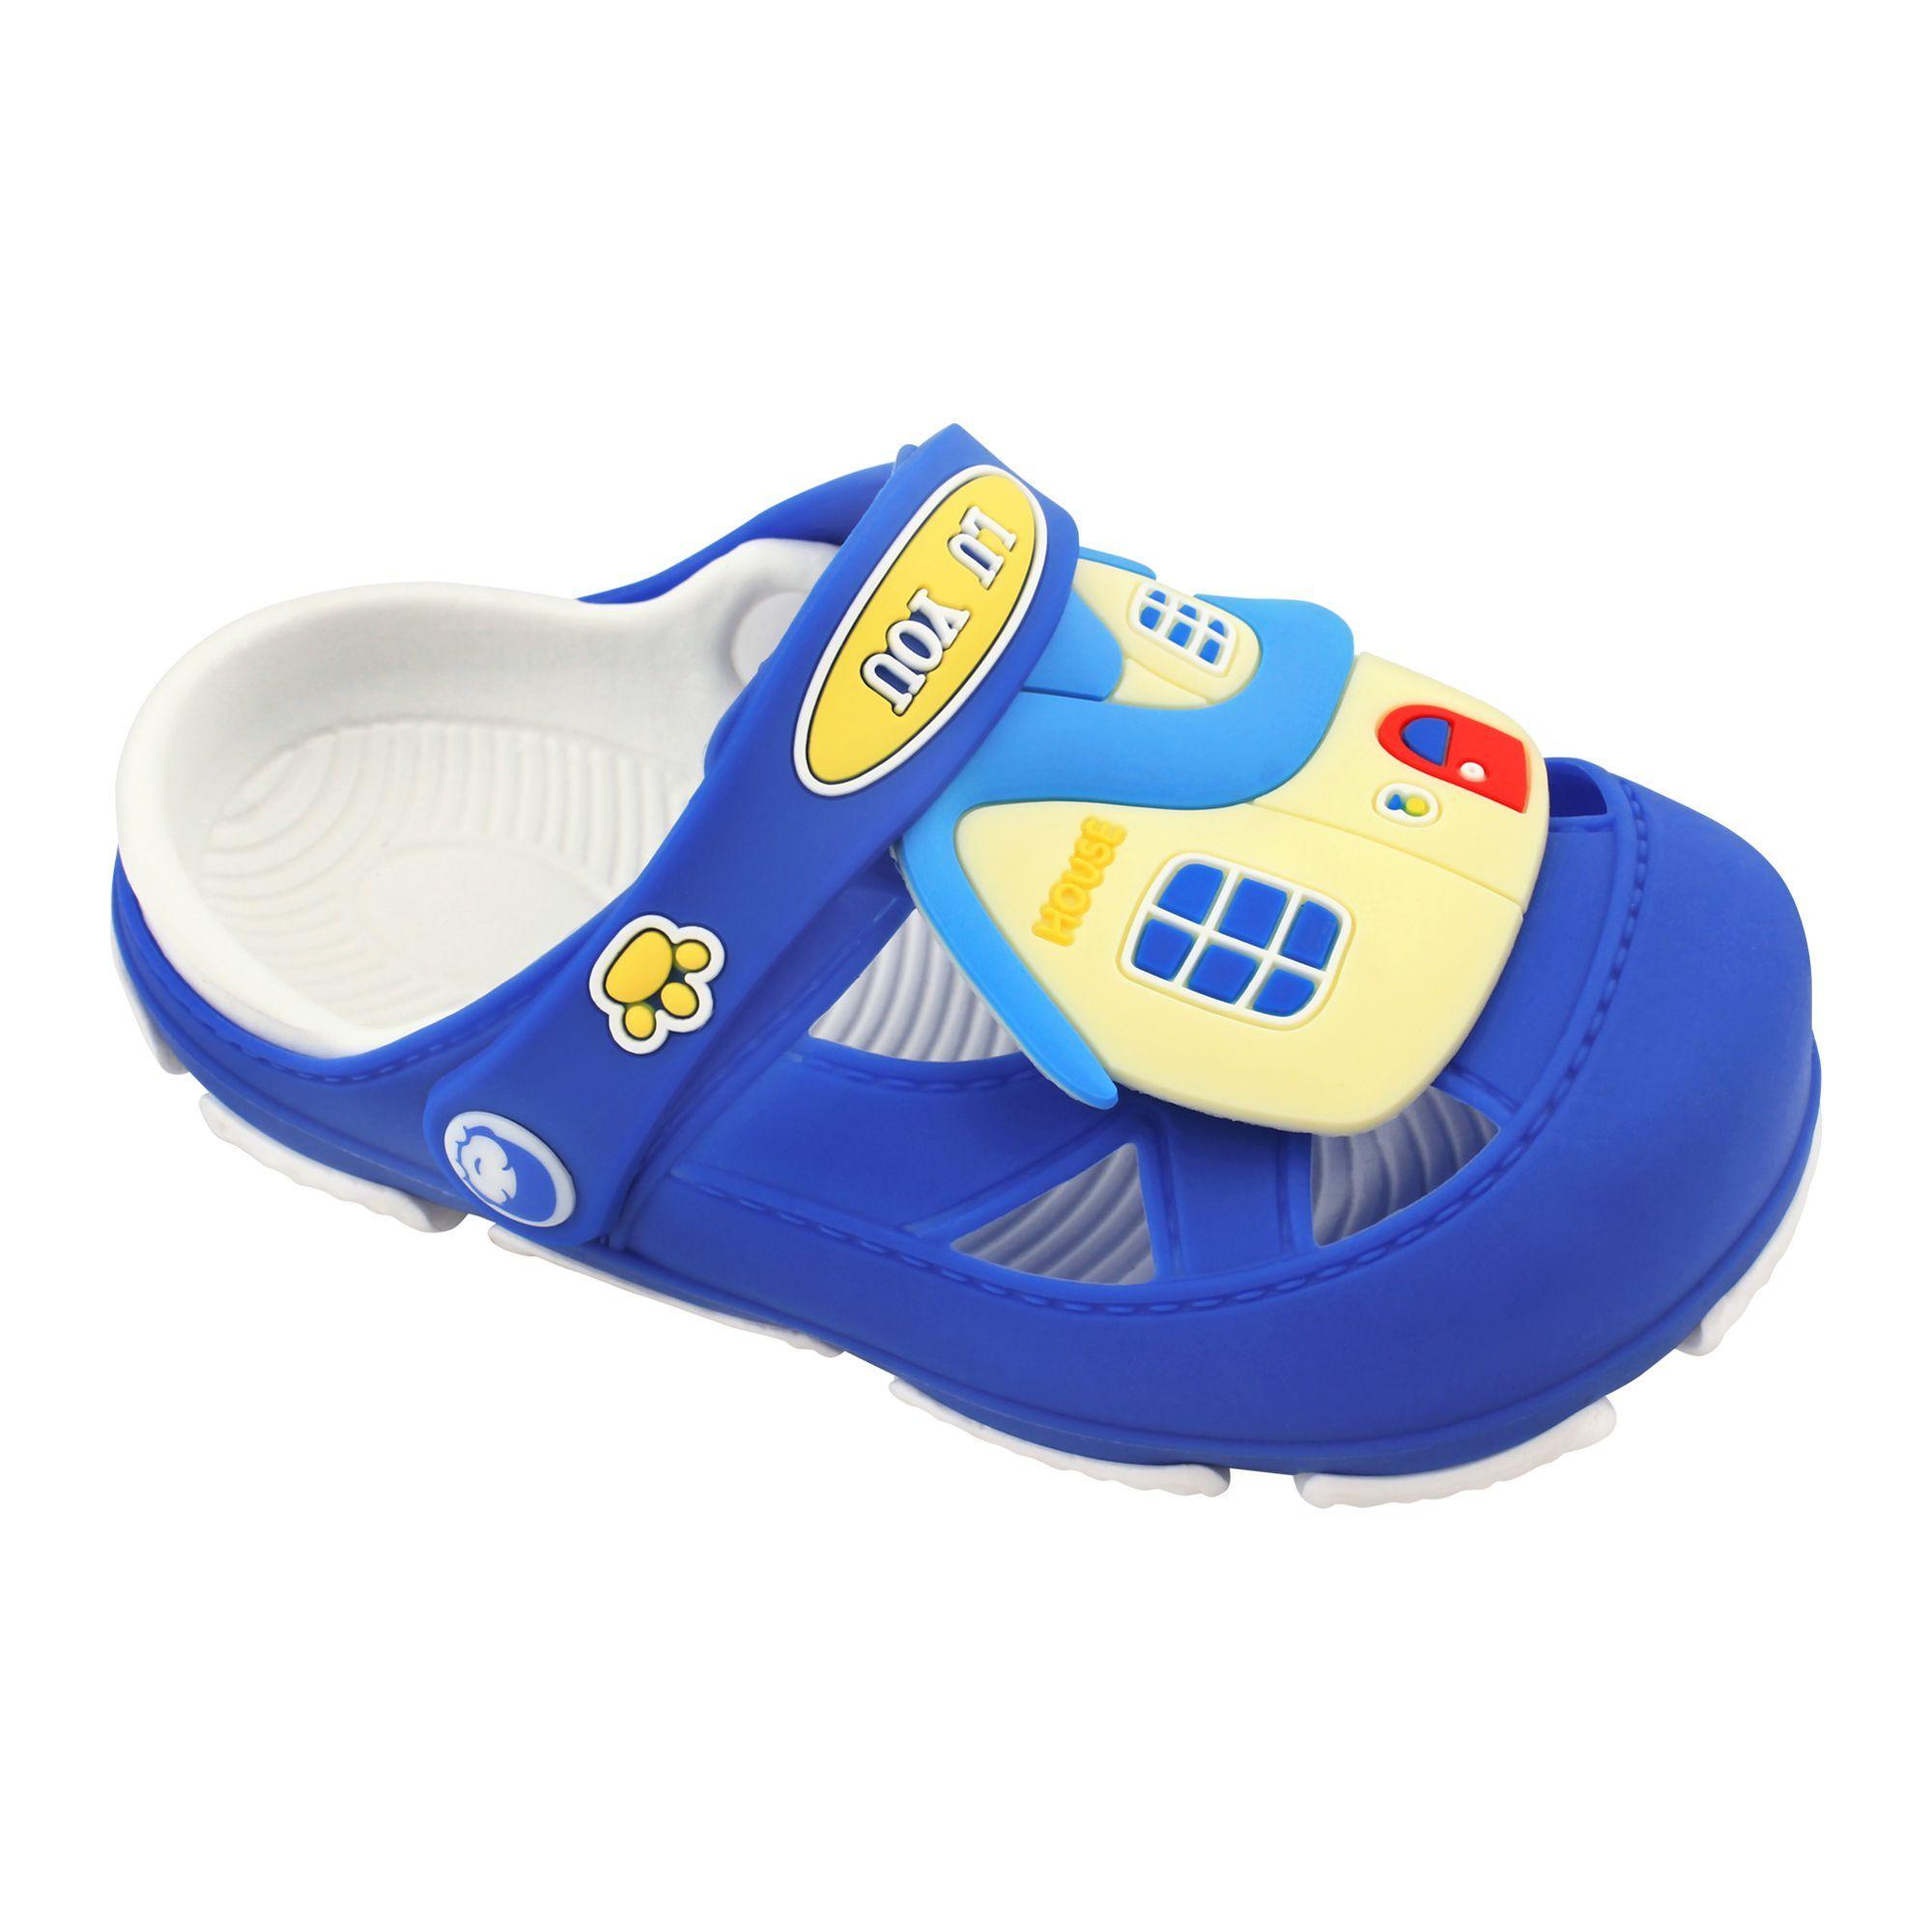 Buy Baby Crocs Kids Sandals, F-3, Blue